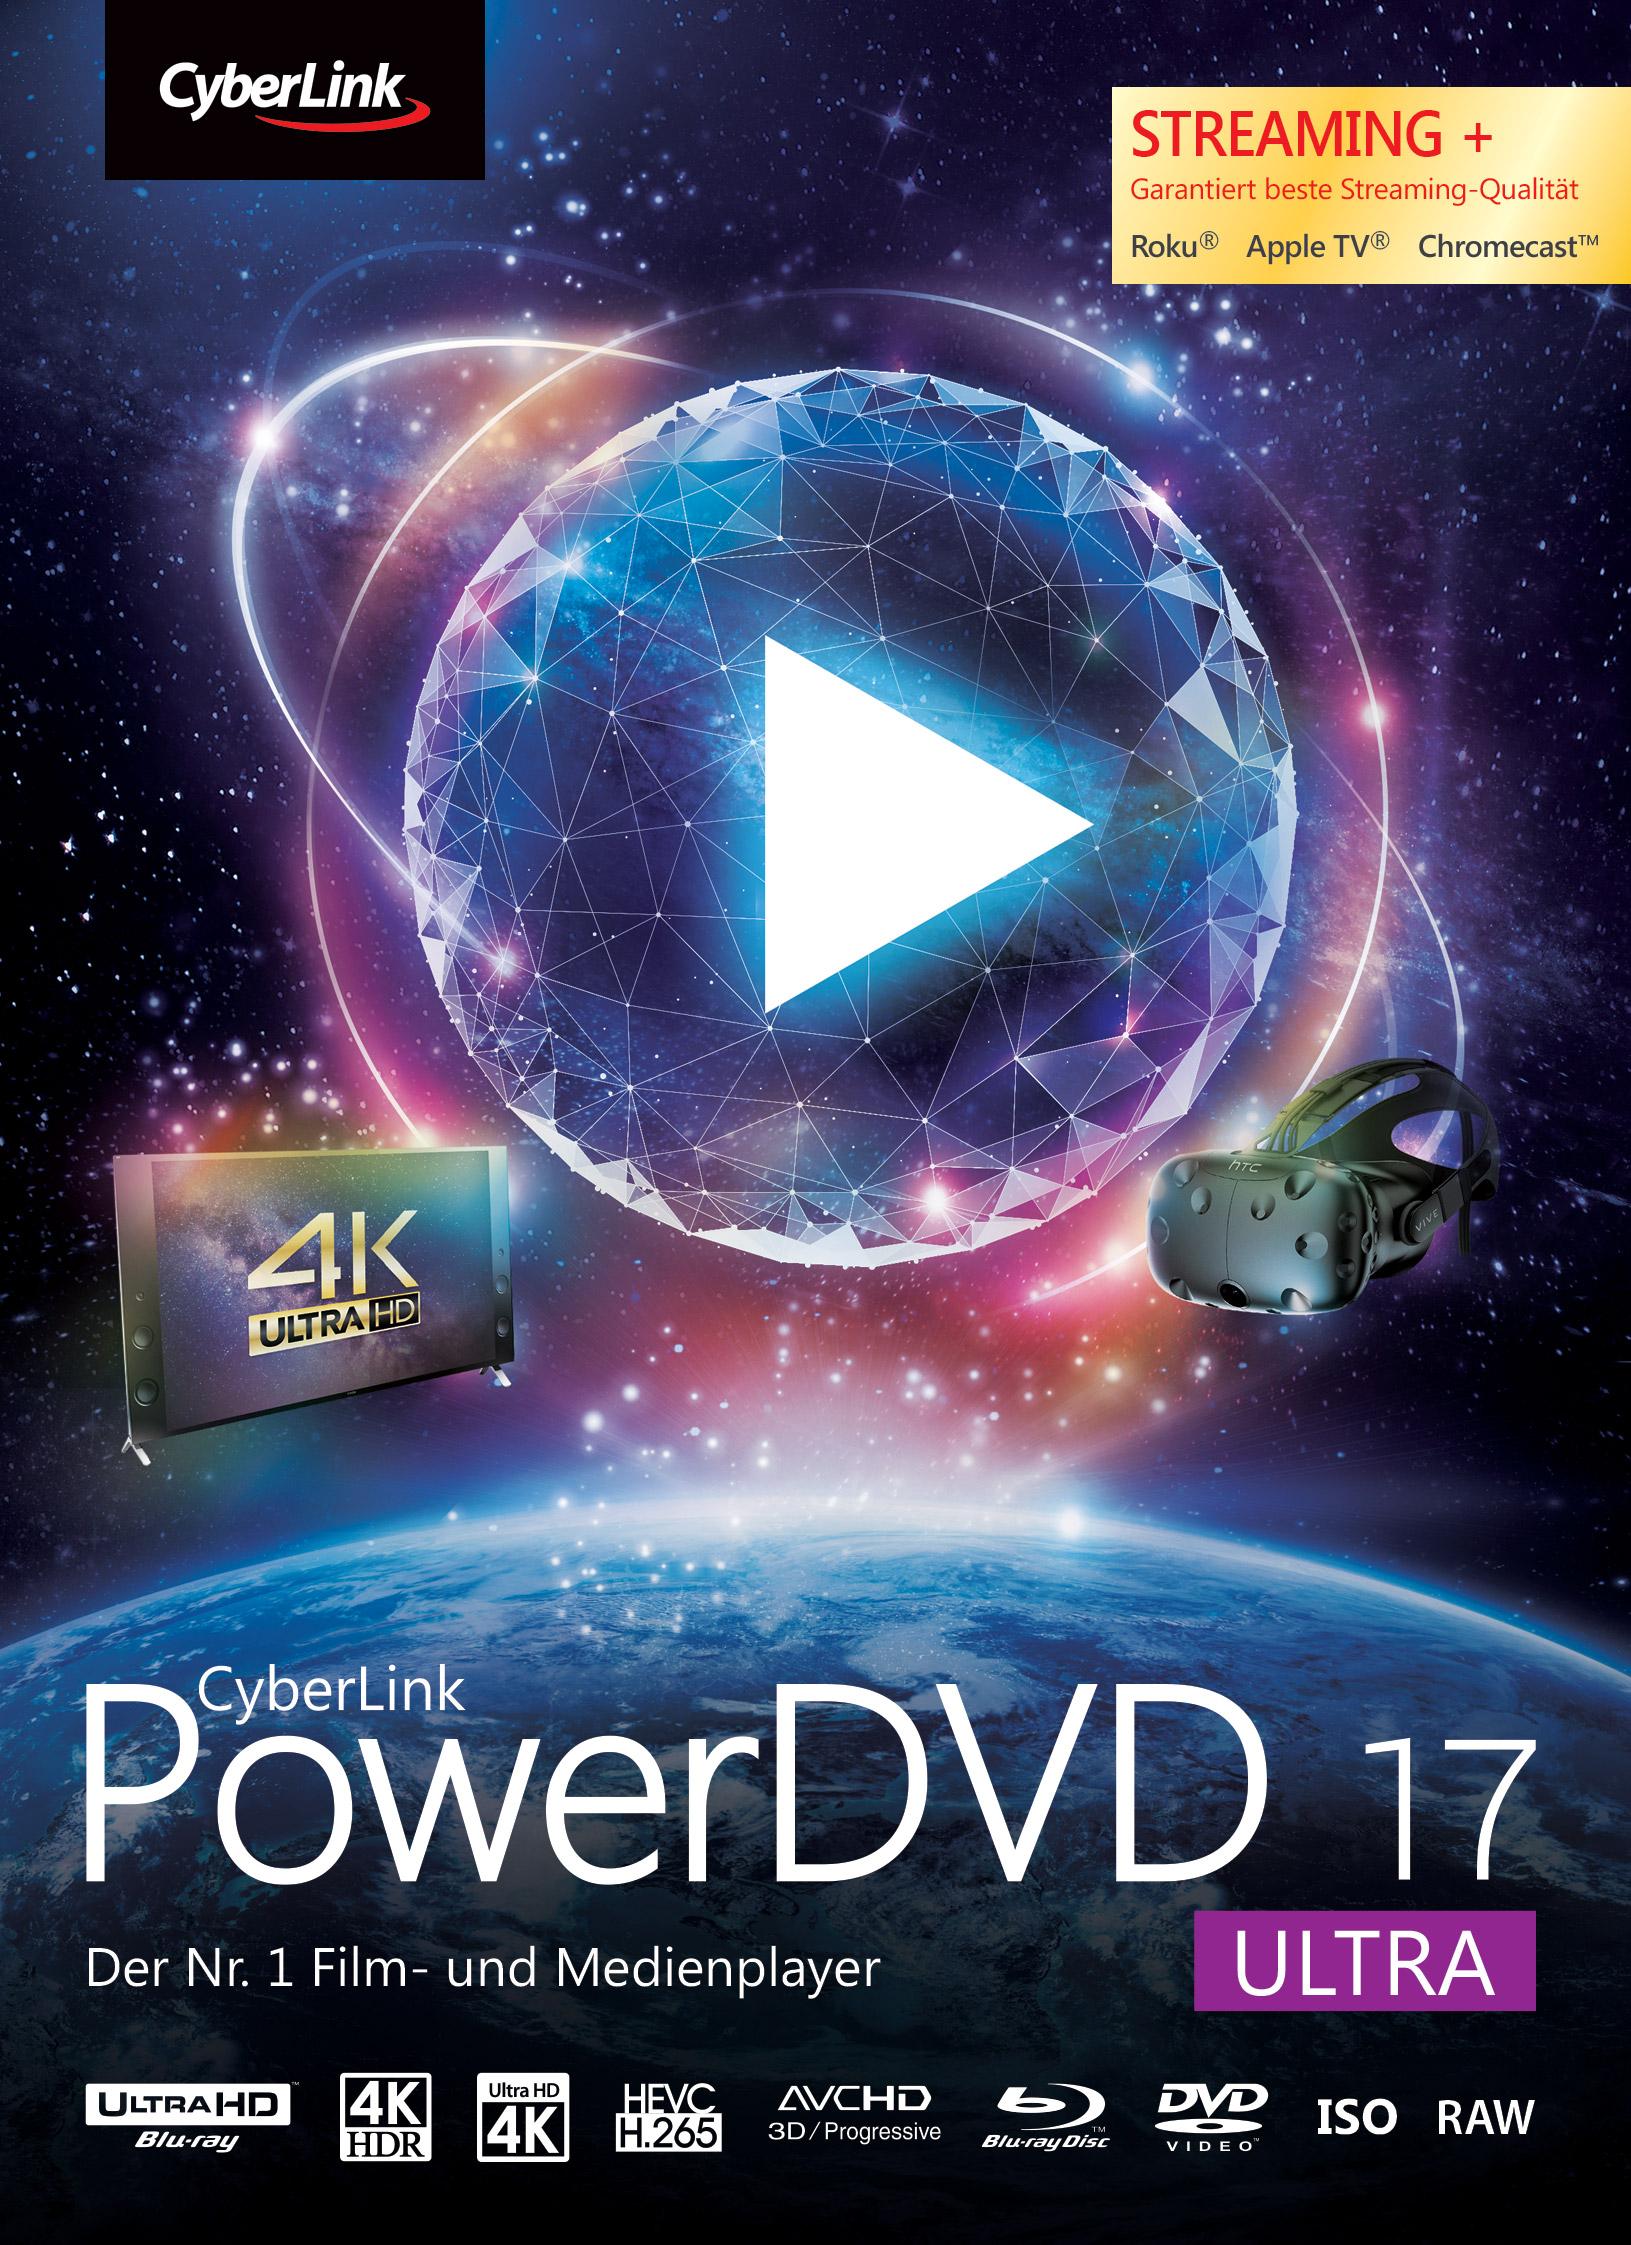 powerdvd-17-ultra-download